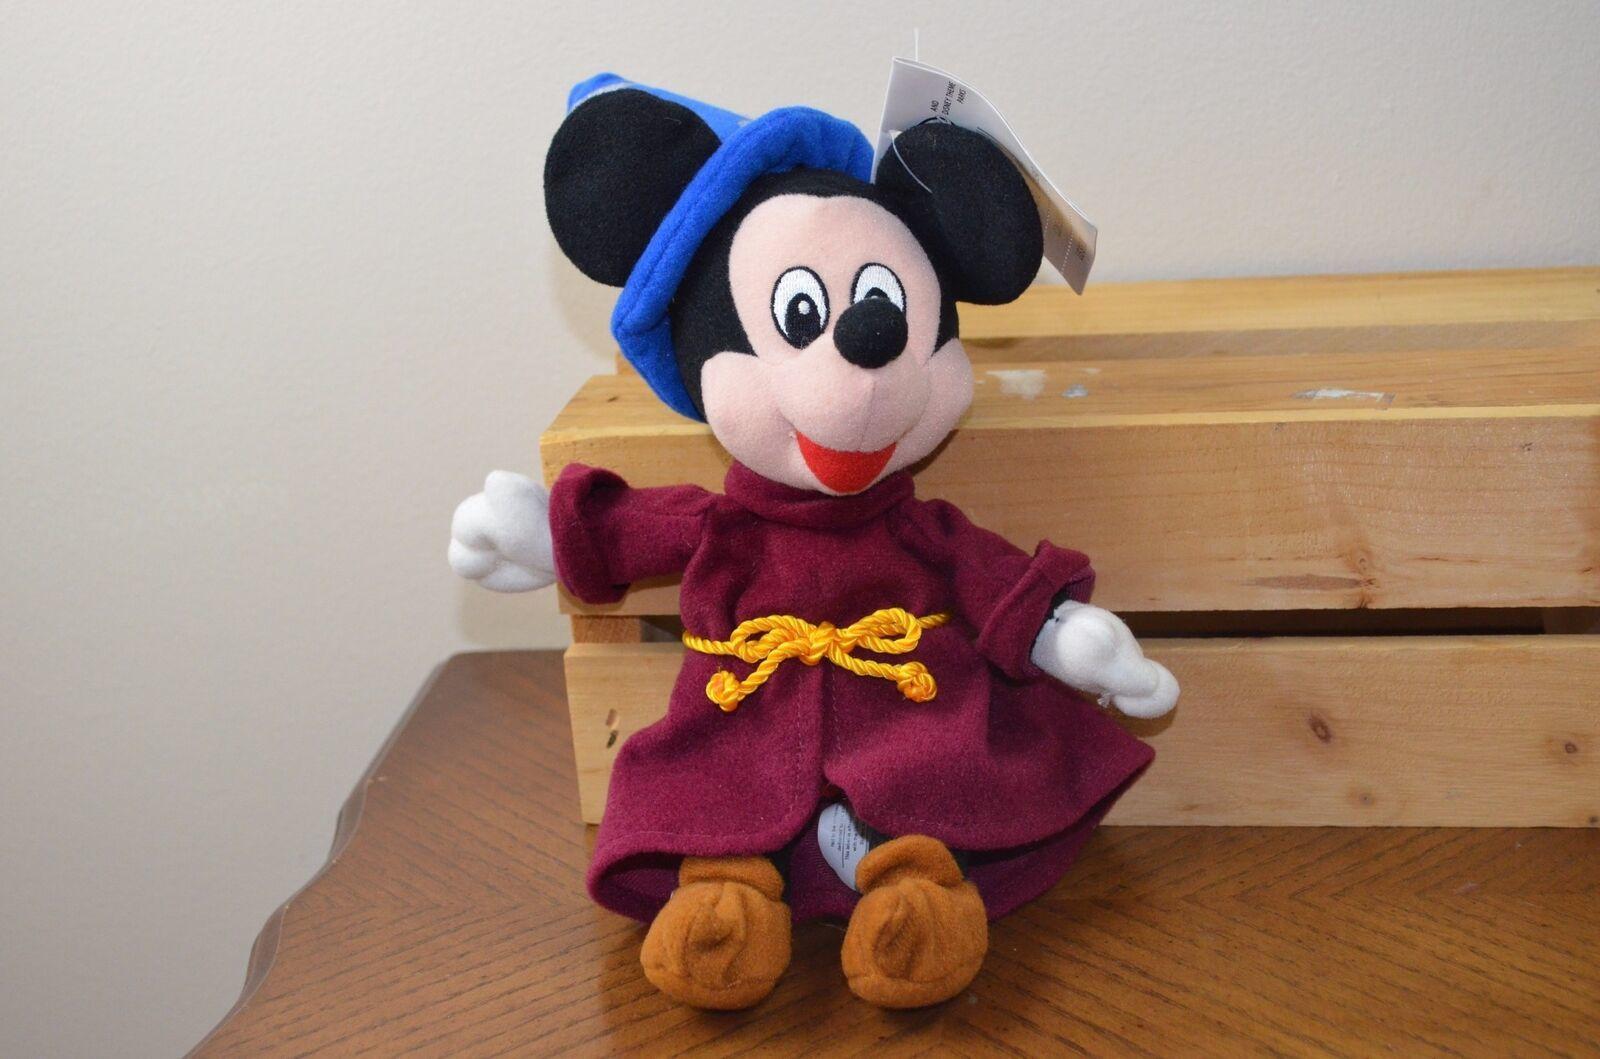 f2be389b4d9 S l1600. S l1600. Previous. Mickey Mouse Fantasia Sorcerer Disney Store  Mini Bean Bag Beanie Plush ...